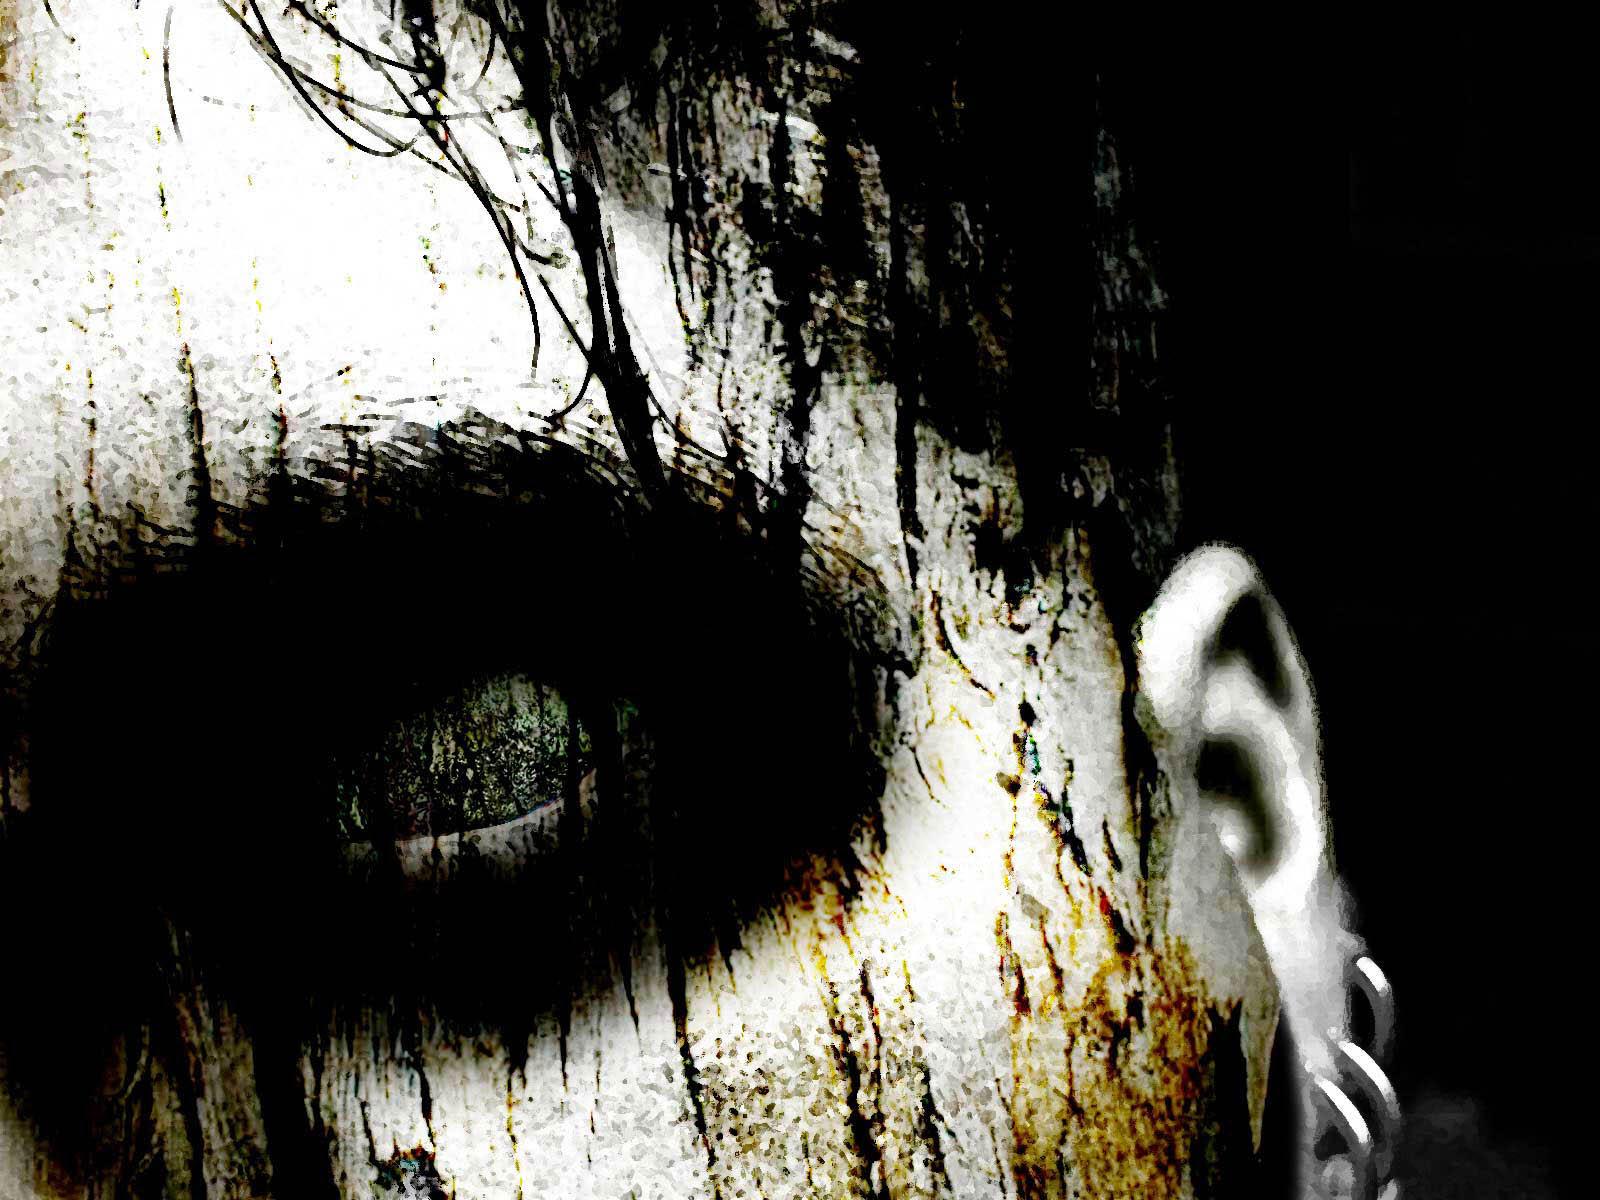 horror eye wallpaper hd - photo #33